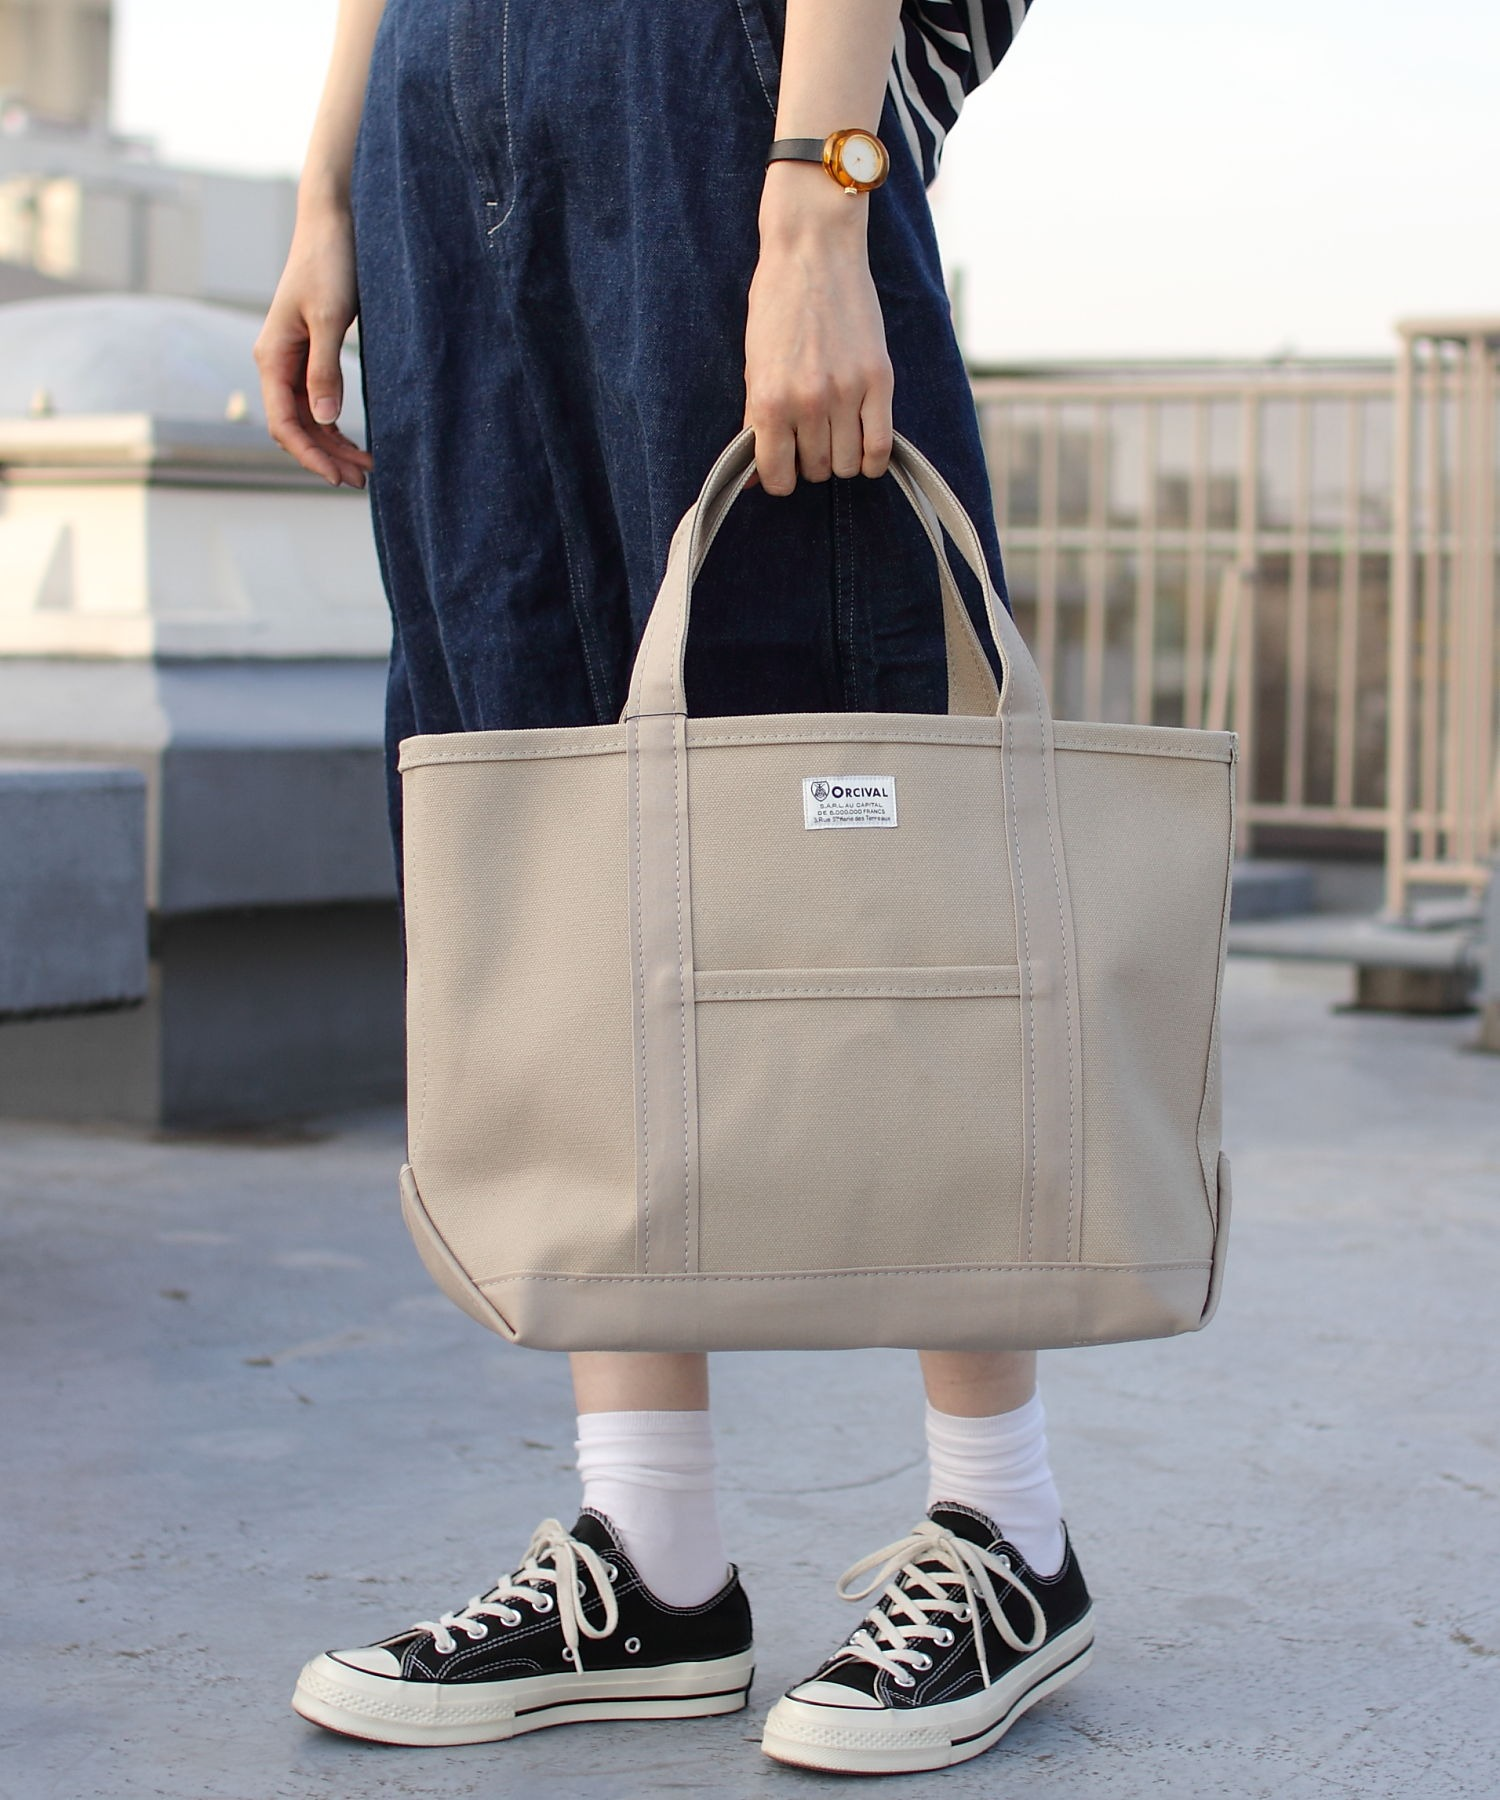 ORCIVAL/オーシバル トートバッグ ソリッド TOTE BAG SOLID #RC-7042